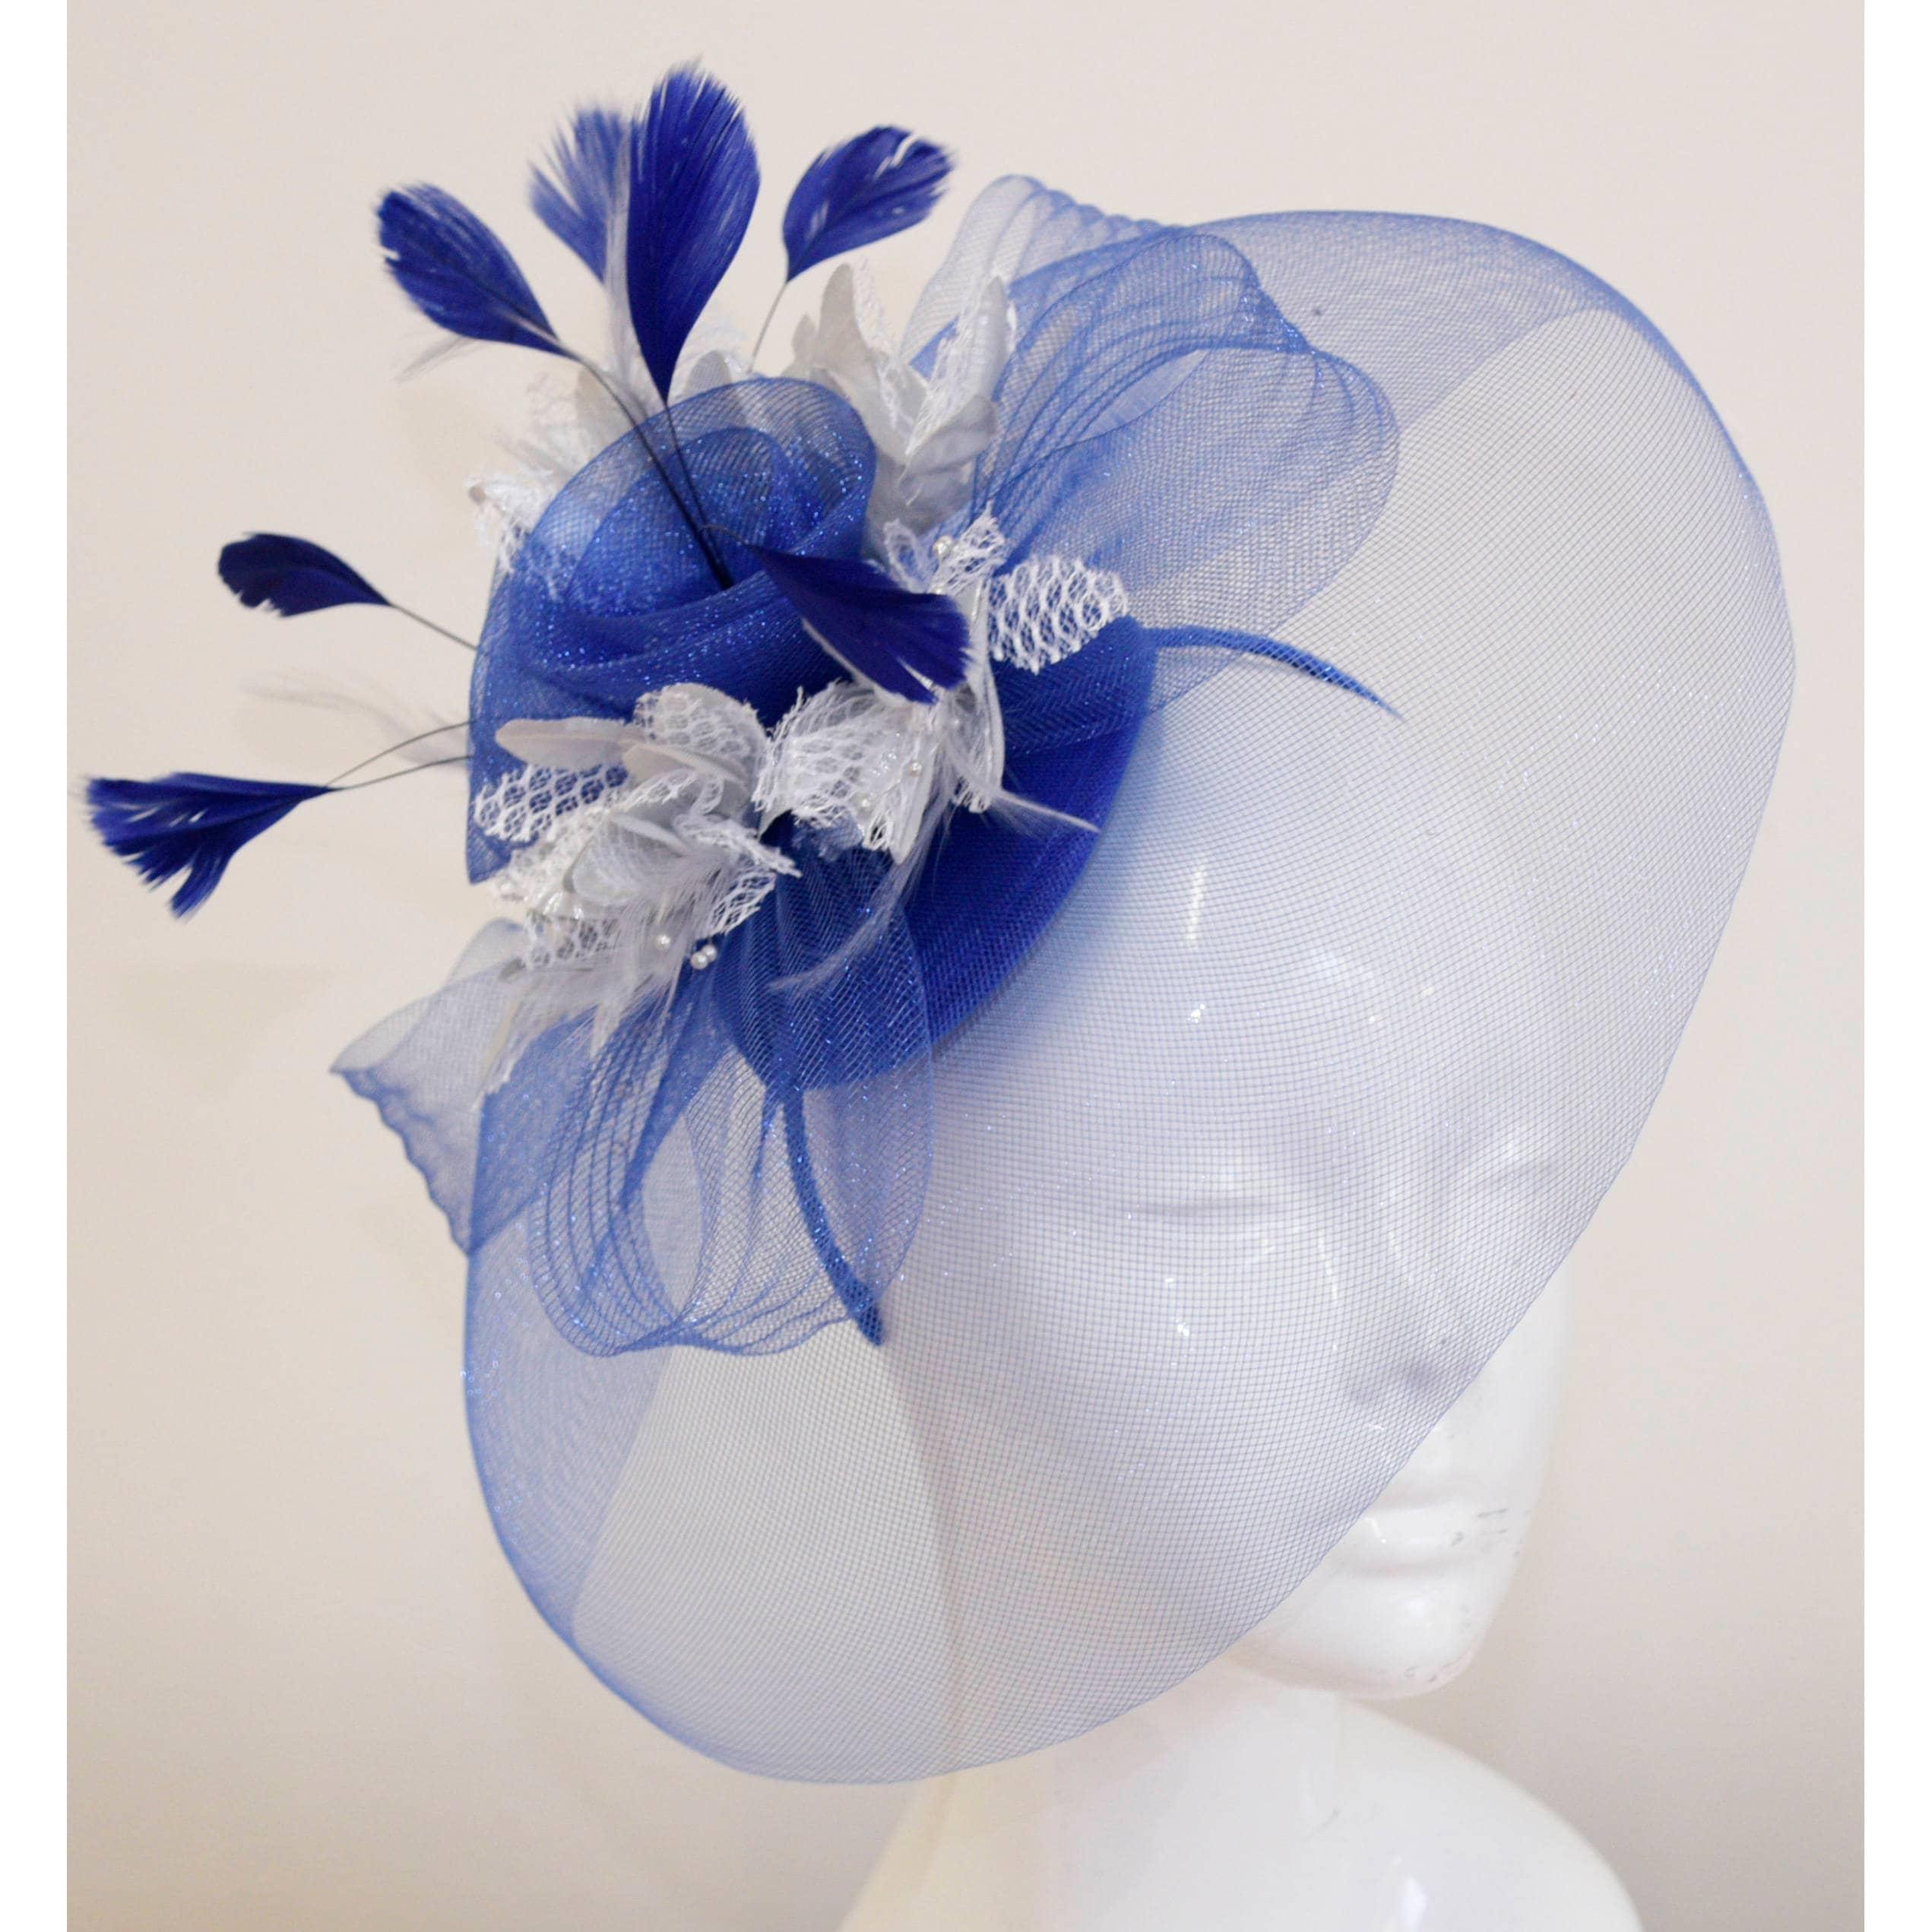 Caprilite Big Royal Blue and Silver Fascinator Hat Veil Net Hair Clip Ascot  Derby Races Wedding Headband Feather Flower 167ebae1f12